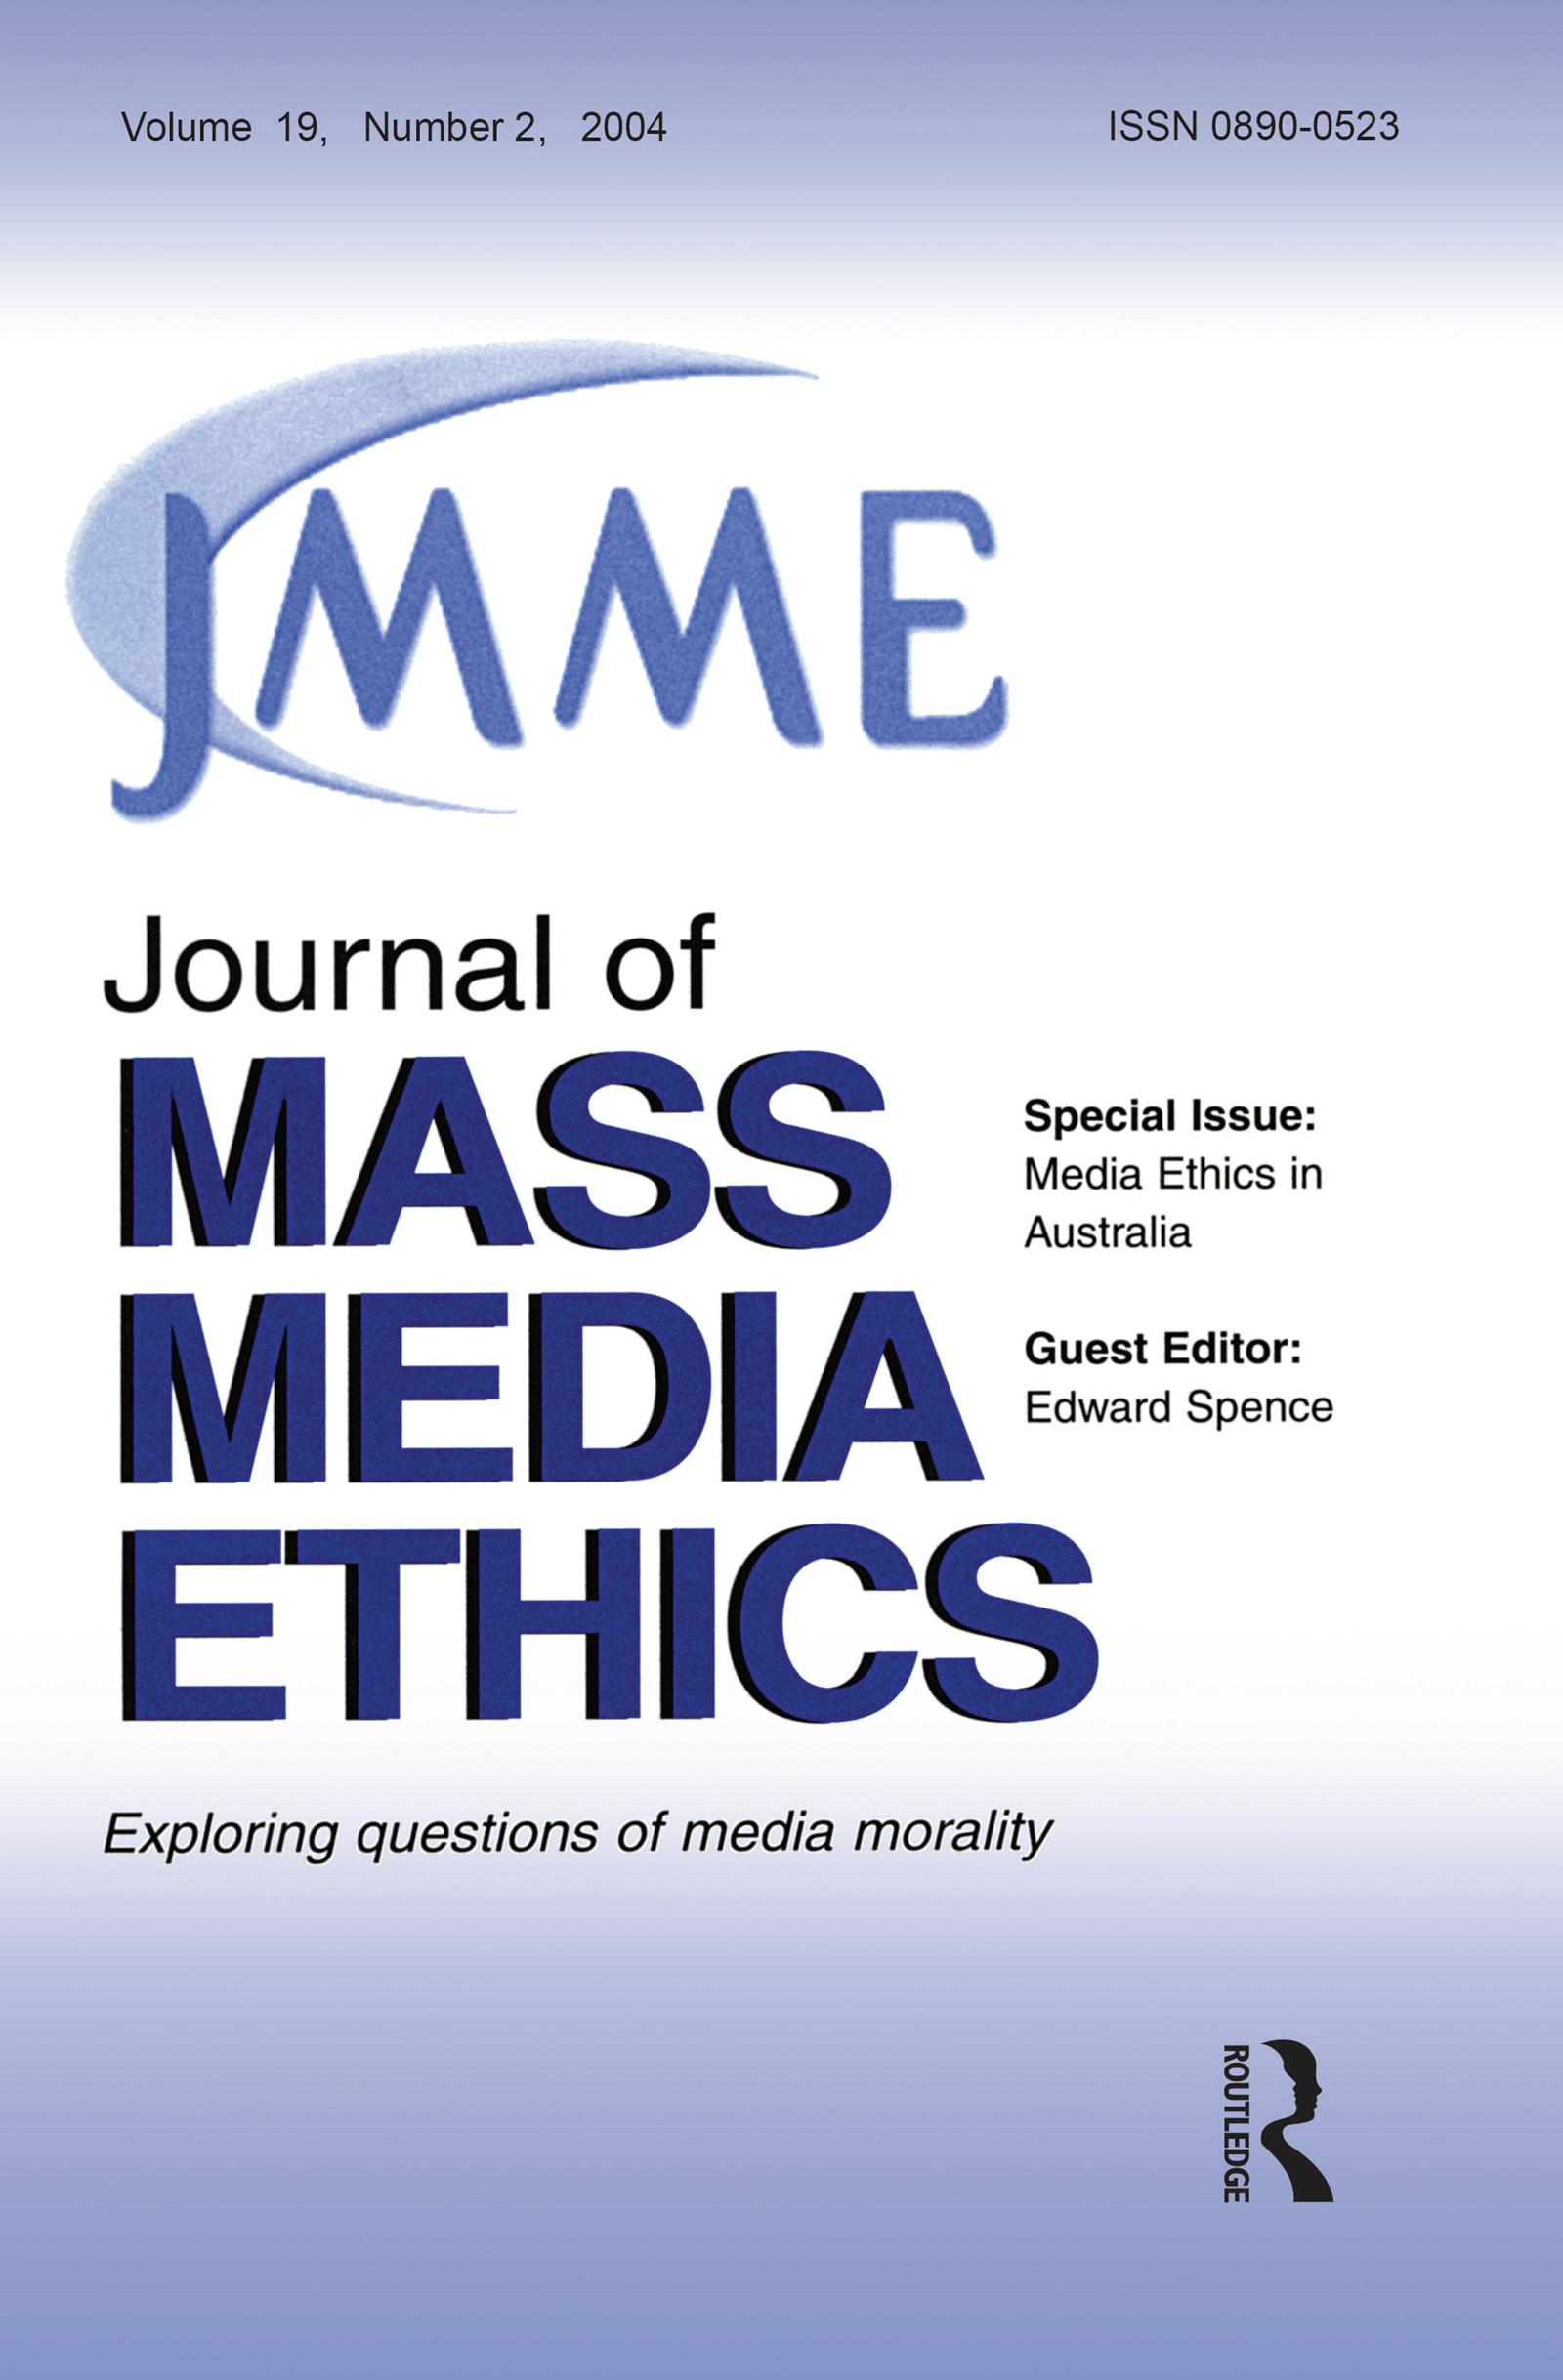 Media Ethics in Australia